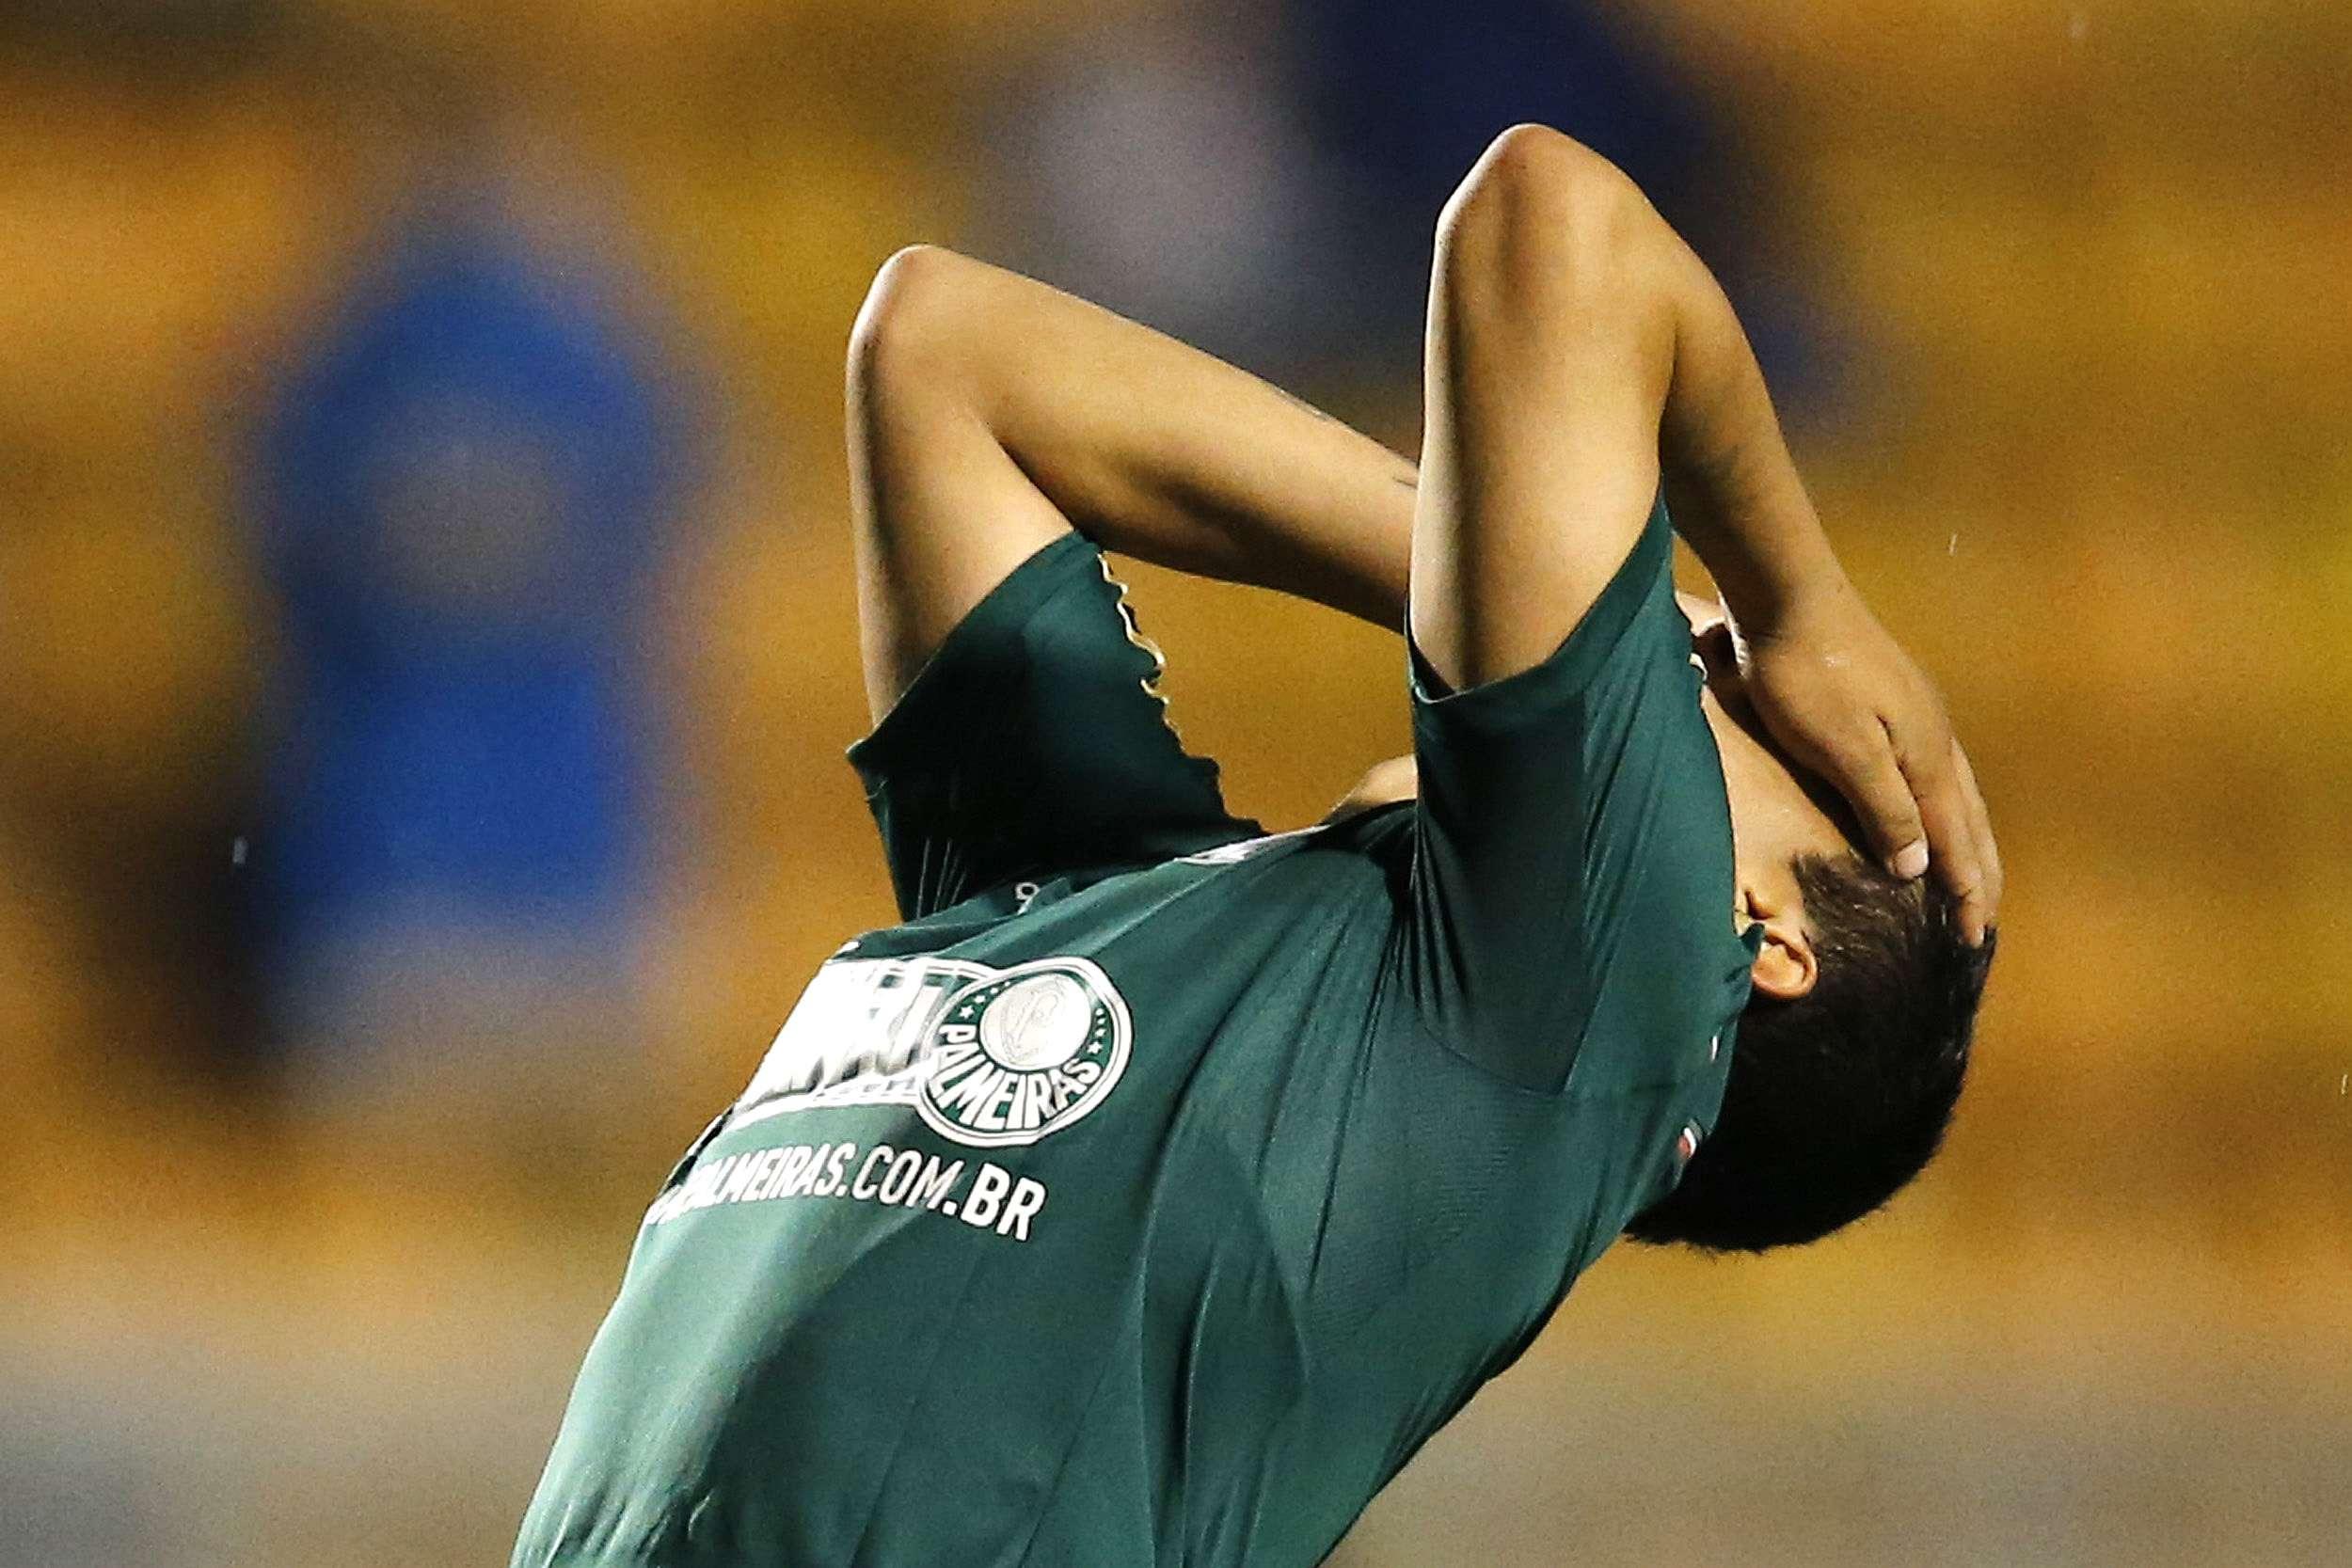 Mendieta lamenta derrota do Palmeiras para Ituano no Pacaembu; equipe alviverde foi eliminada na semifinal do Campeonato Paulista Foto: Mauro Horita/Agif/Gazeta Press